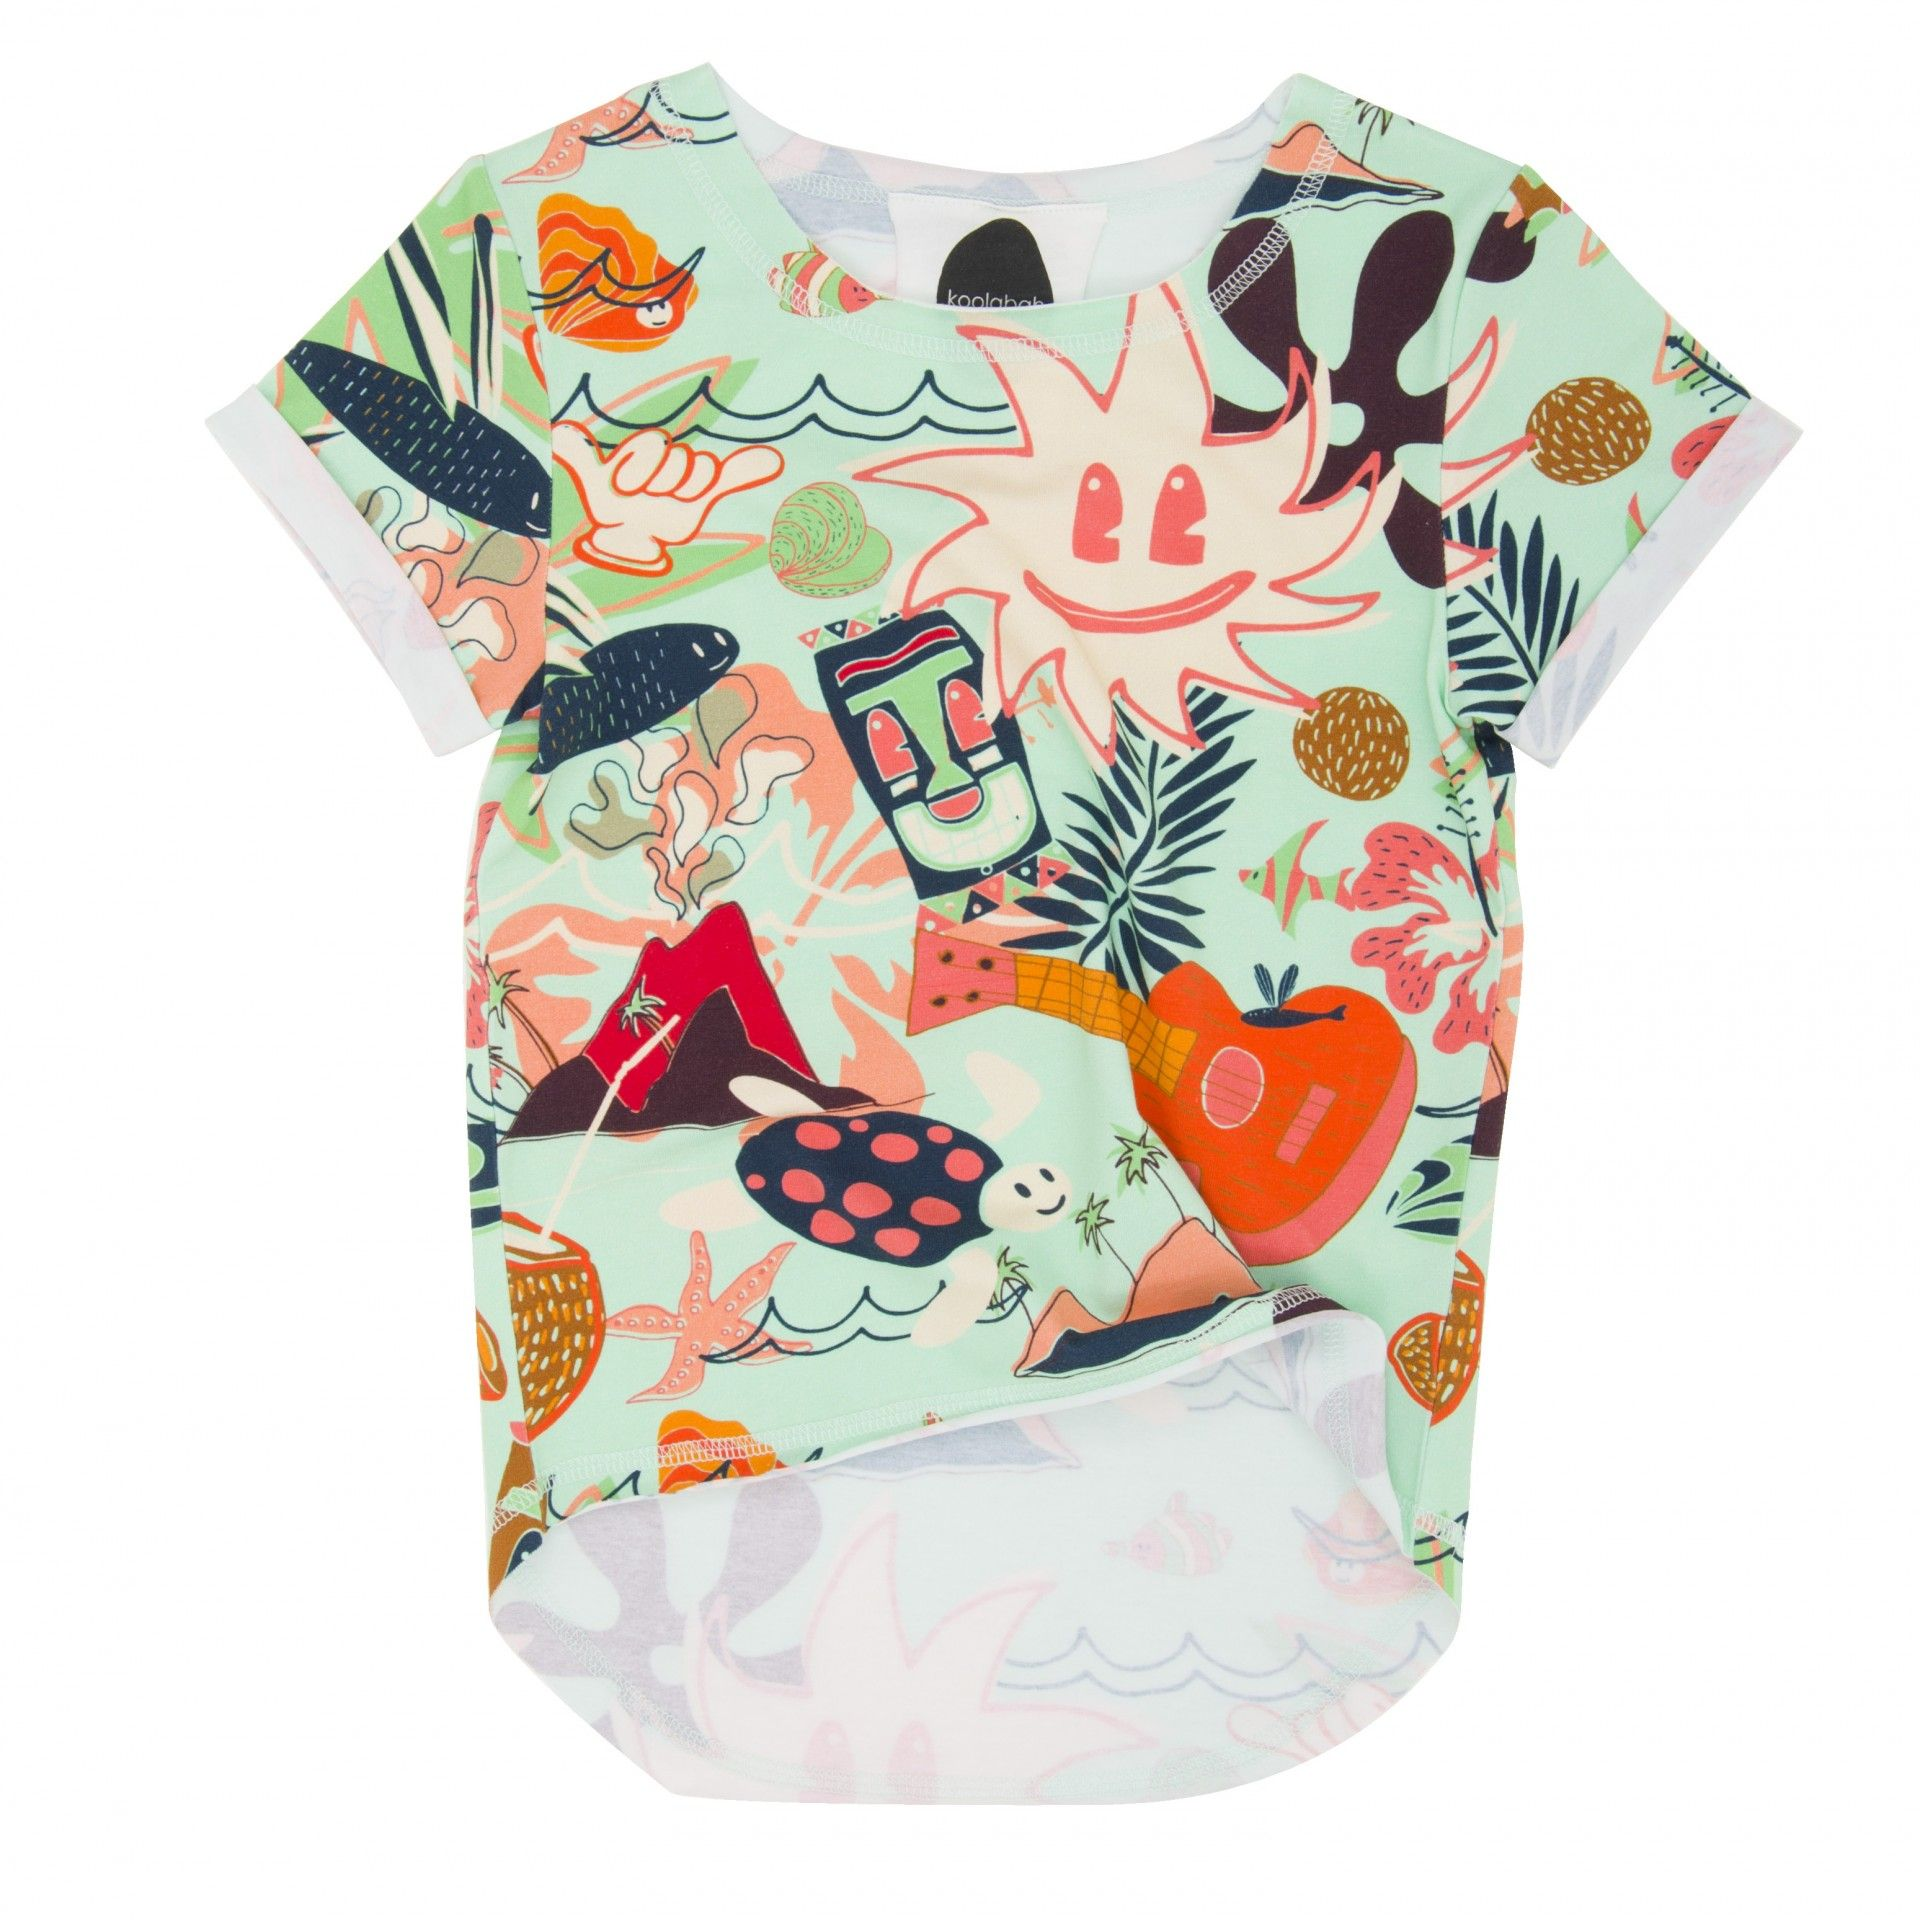 93f83c85aa6 Koolabah - LO DUNGAREE   Boys&Girls - Παιδικά ρούχα από οργανικό βαμβάκι    Dungarees, Overalls και Jumpsuit